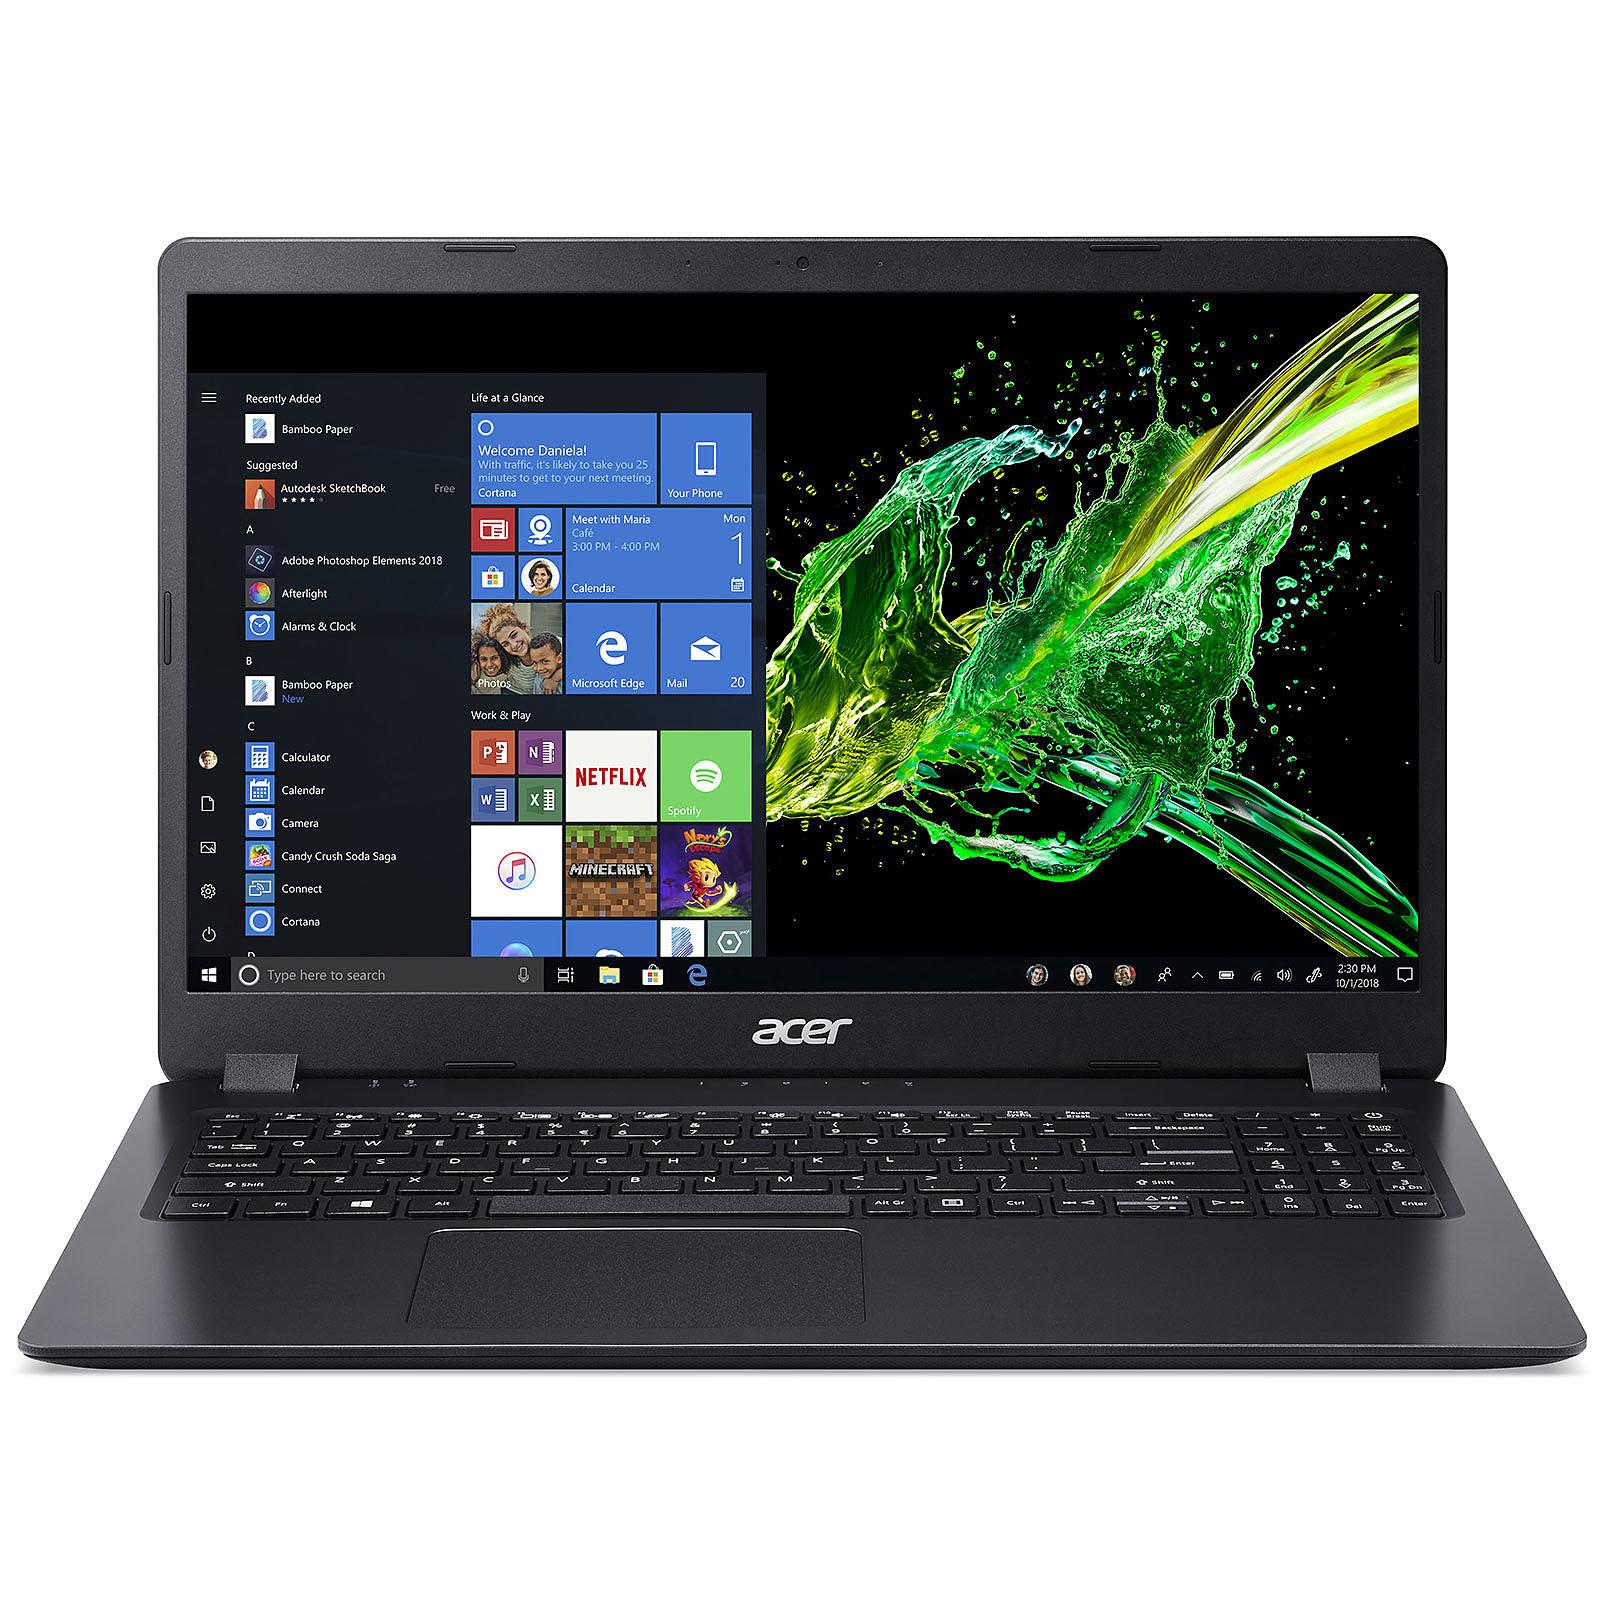 Acer NX.HM2EF.007 - PC portable Acer - Cybertek.fr - 2